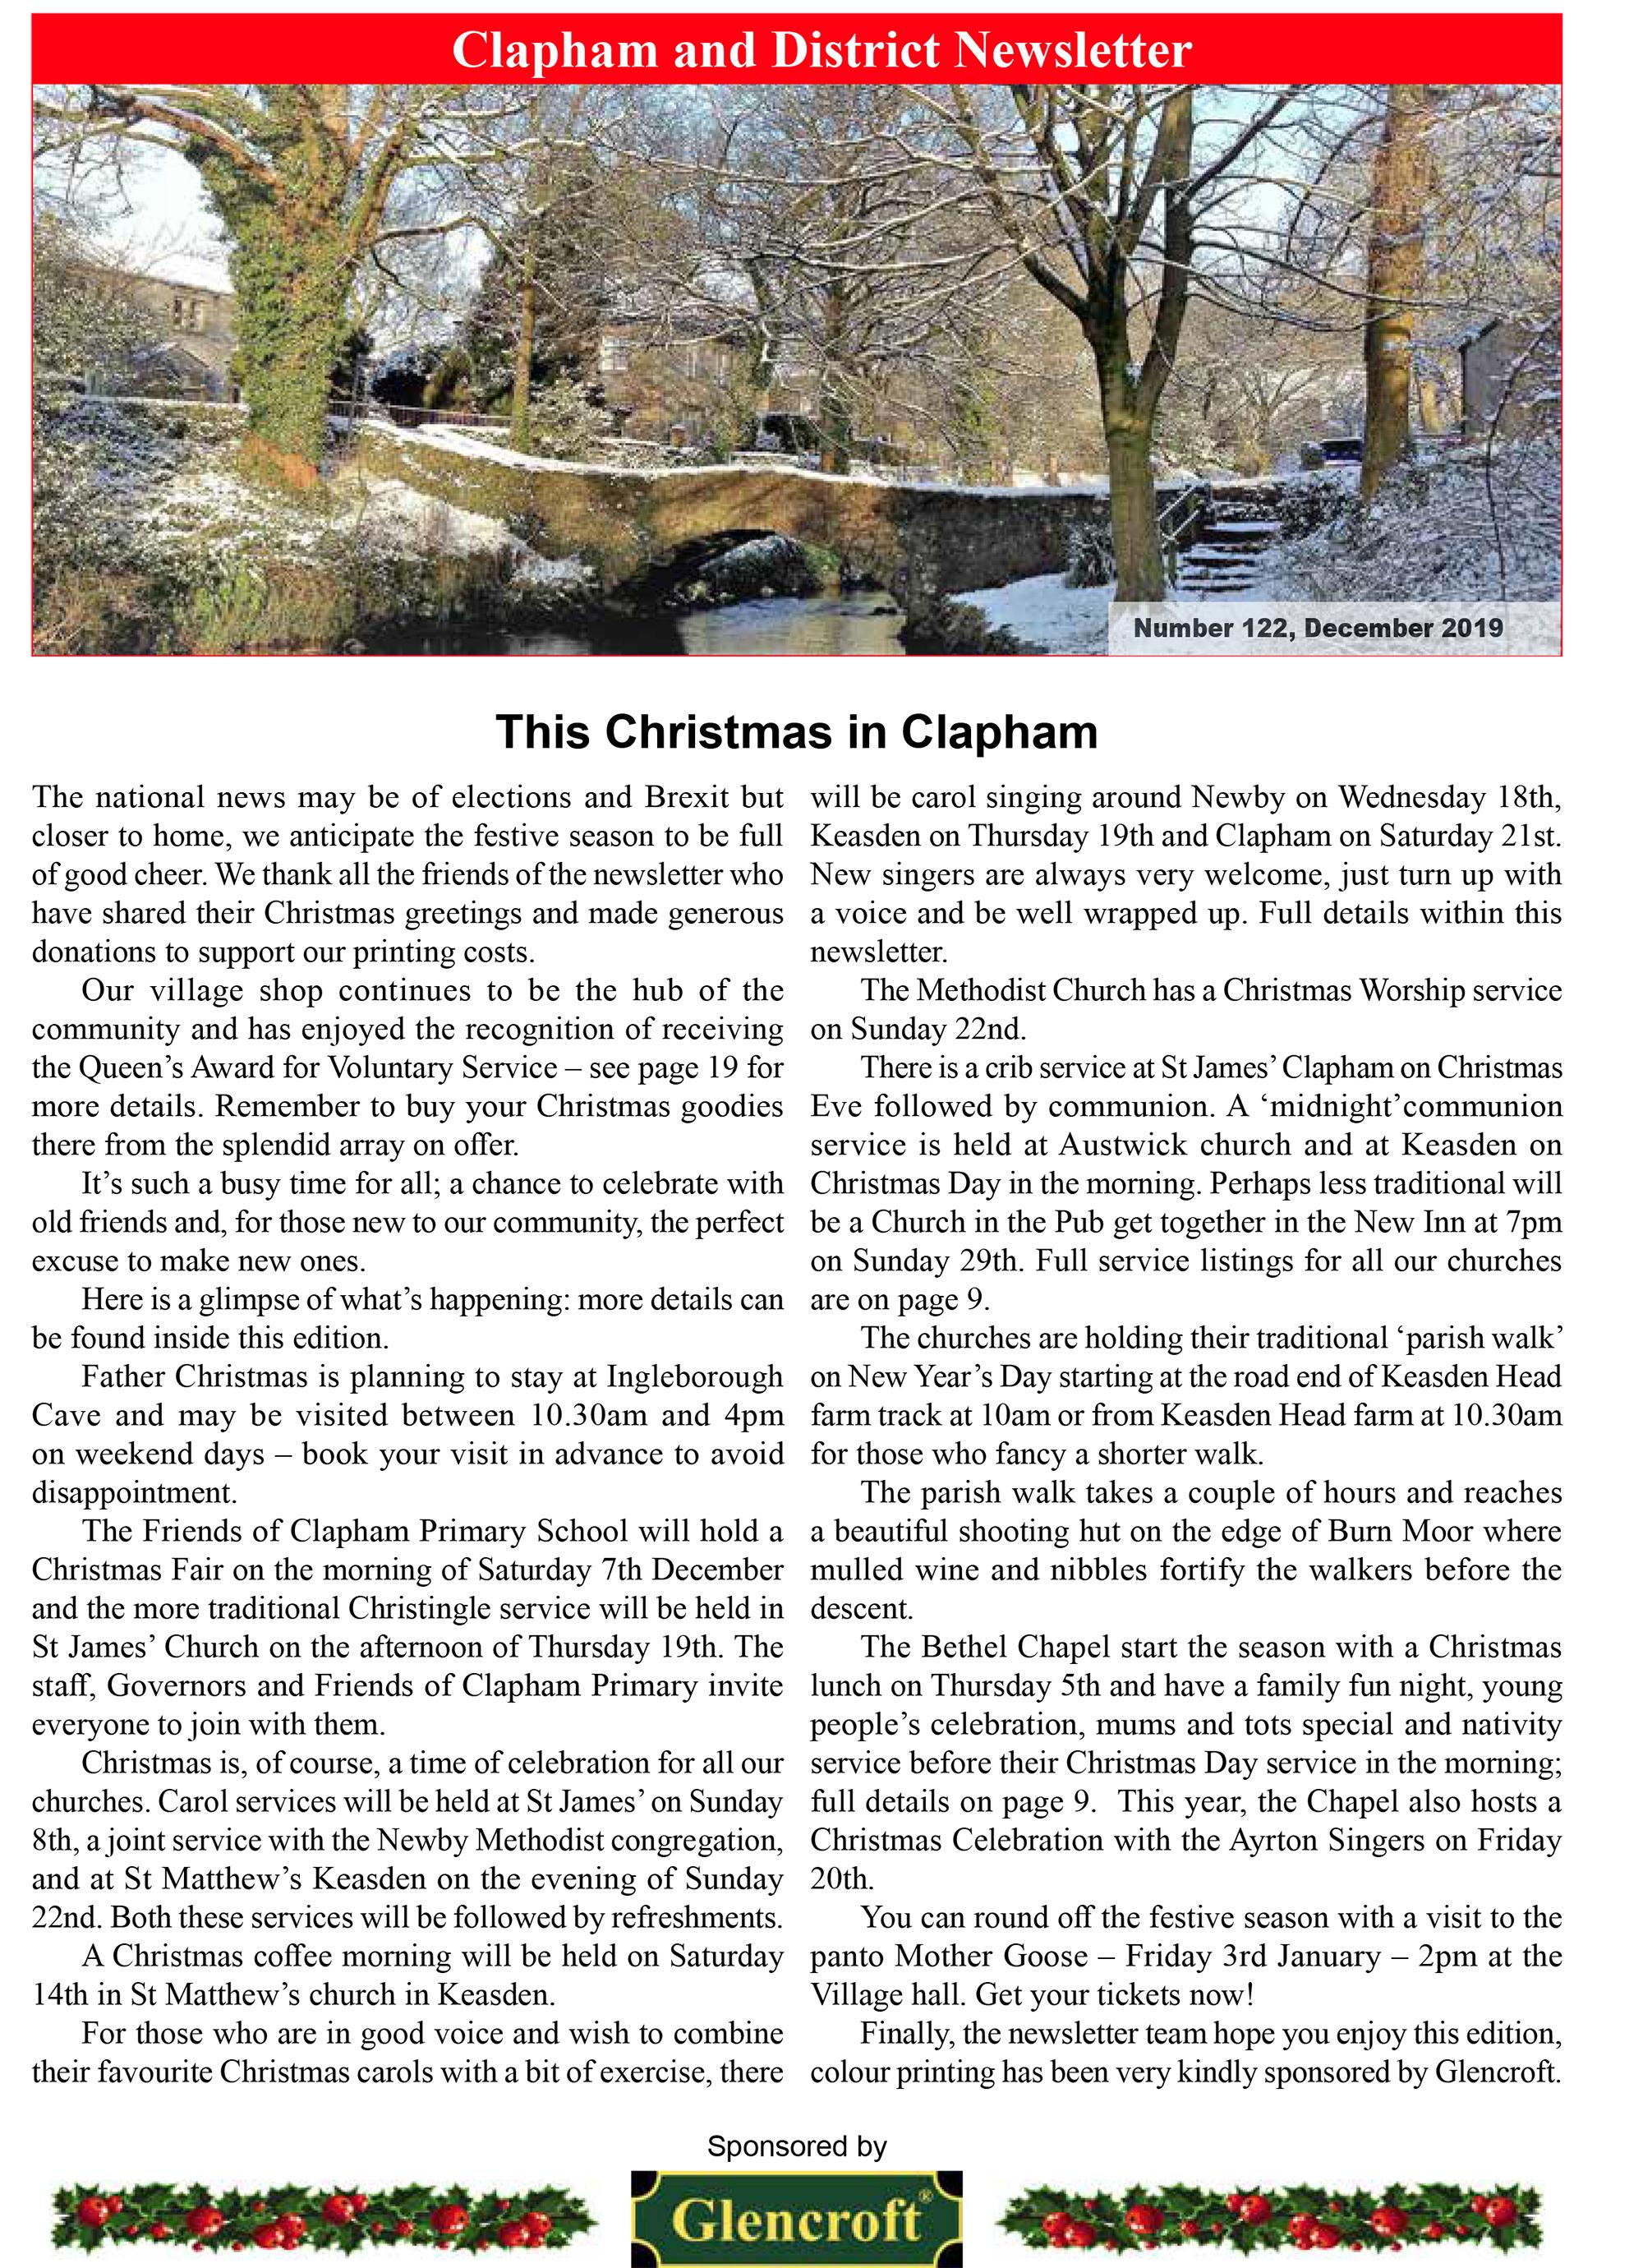 clapham-newsletter-122-december-2019-1